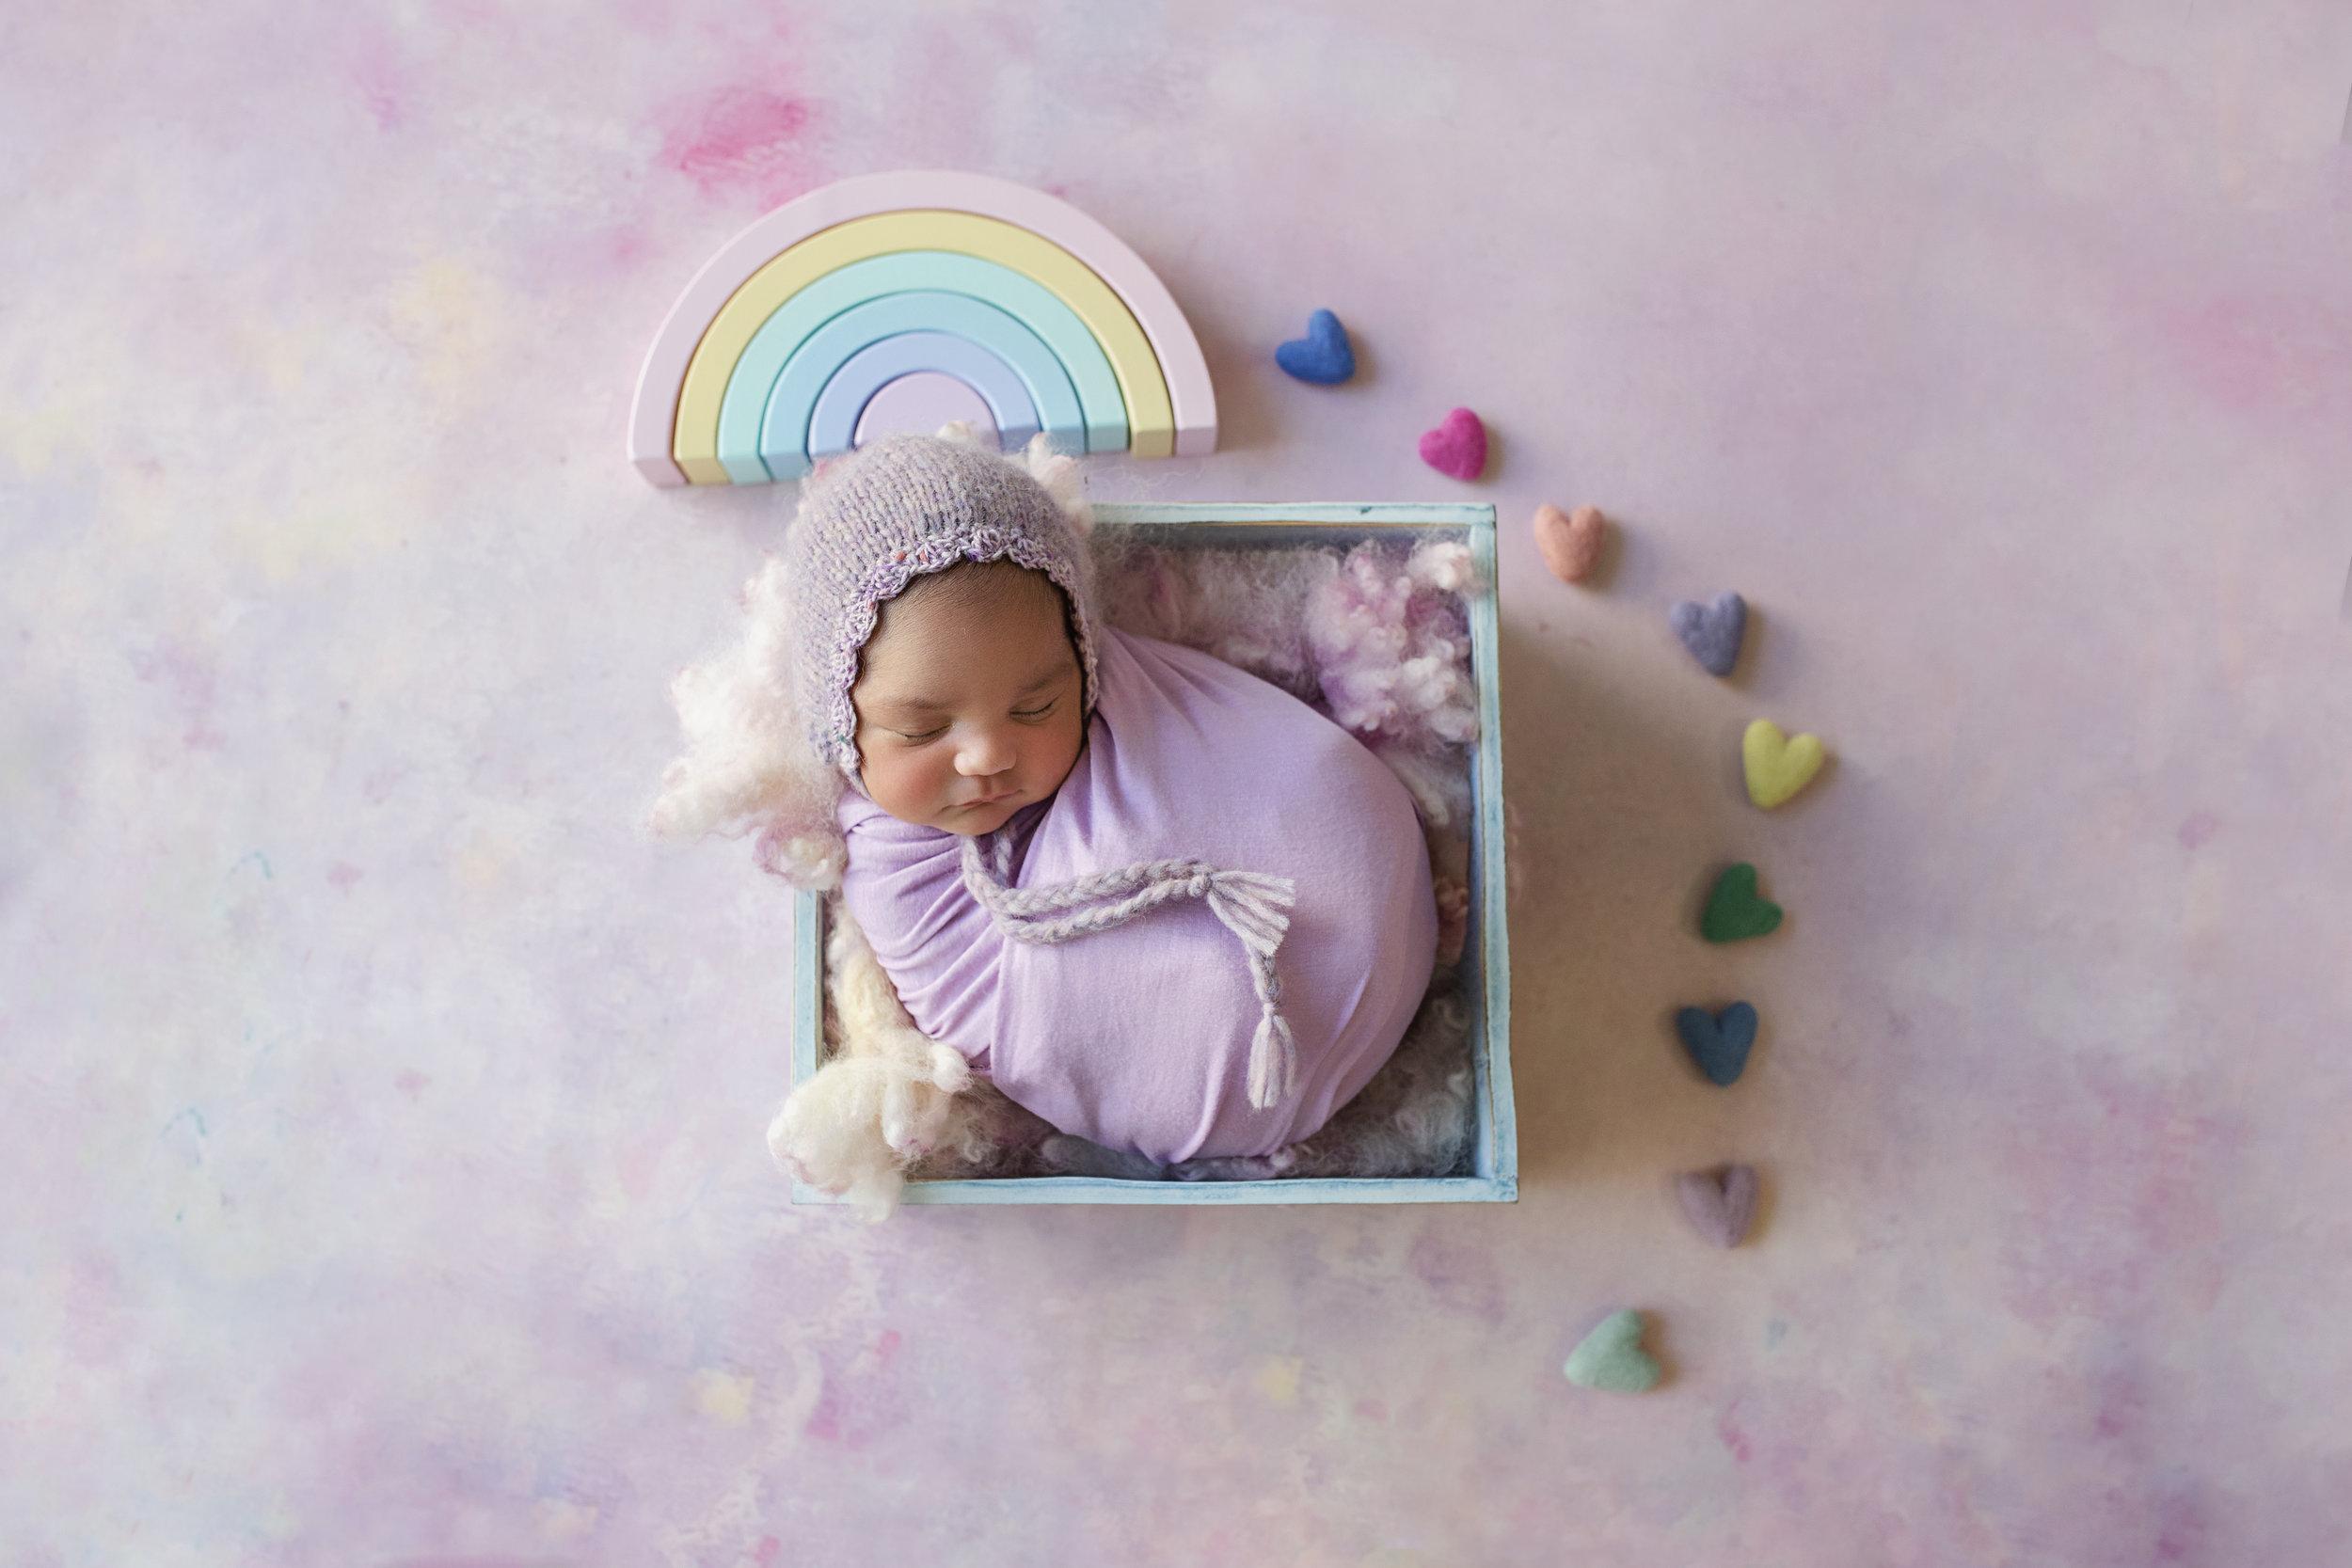 Serena Jones Photography - Serena Joy Putrus - 1.jpg